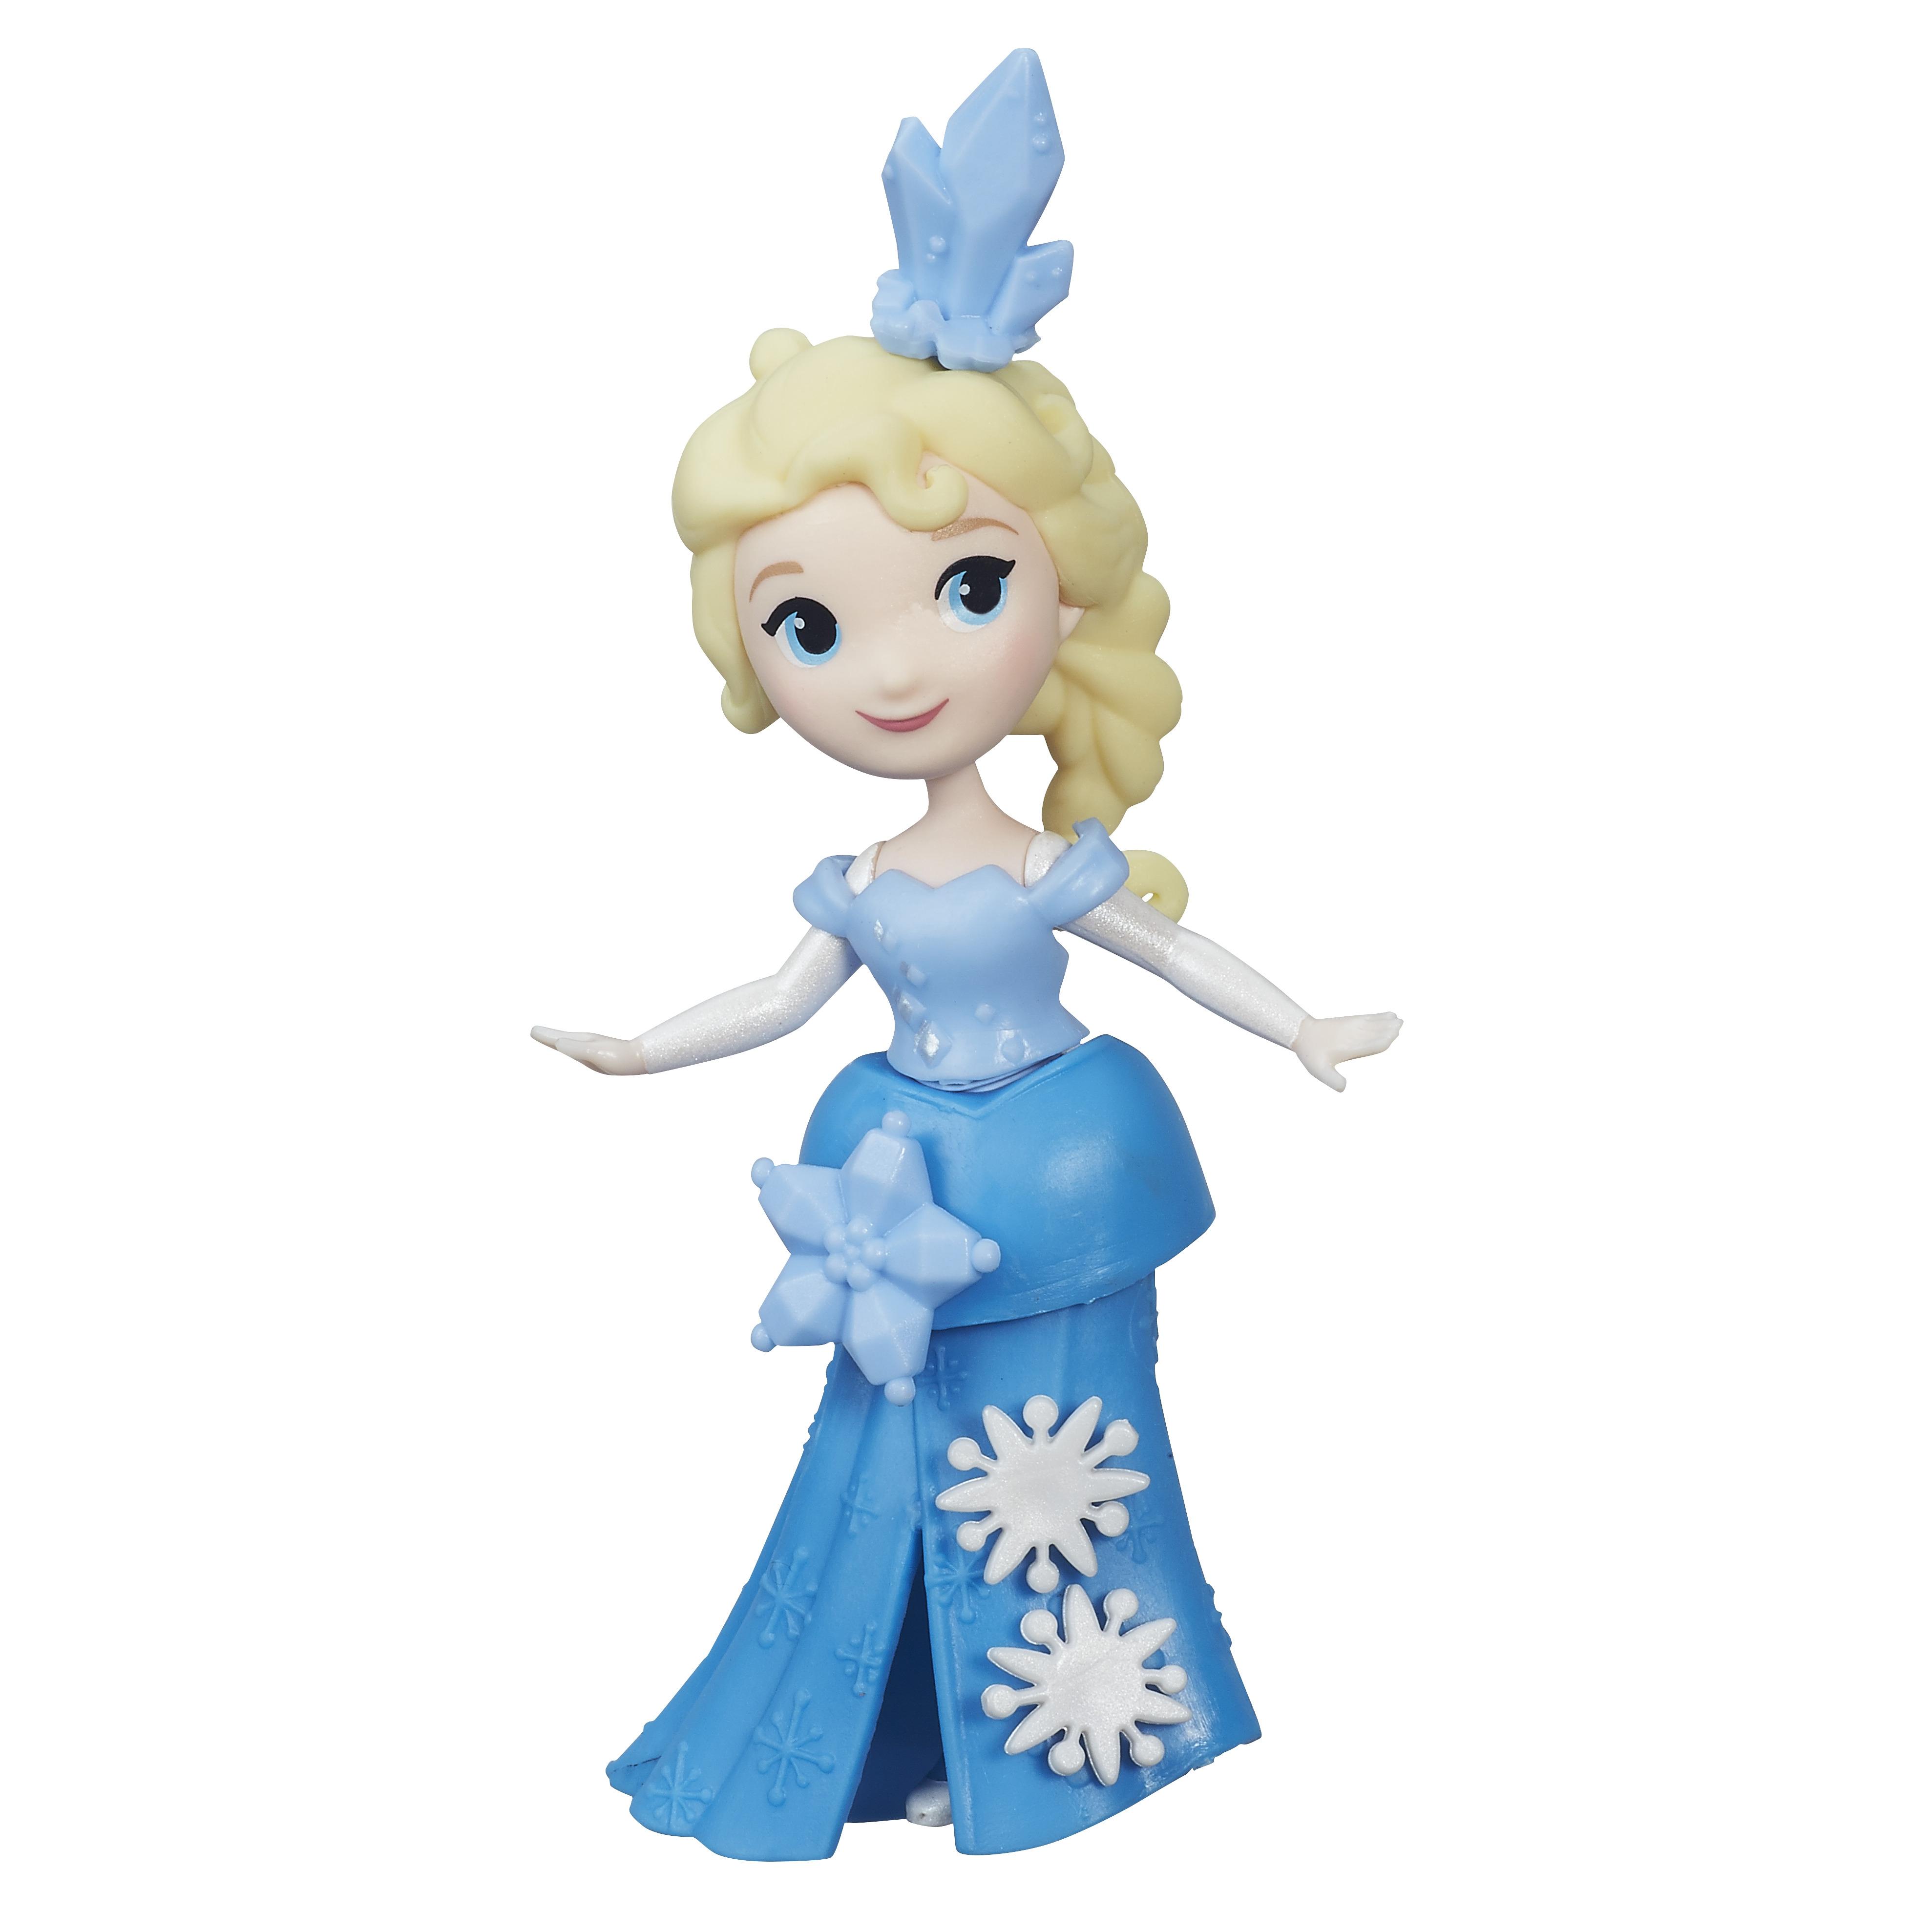 Другие куклы Disney Frozen Холодное сердце disney frozen мини кукла снеговик